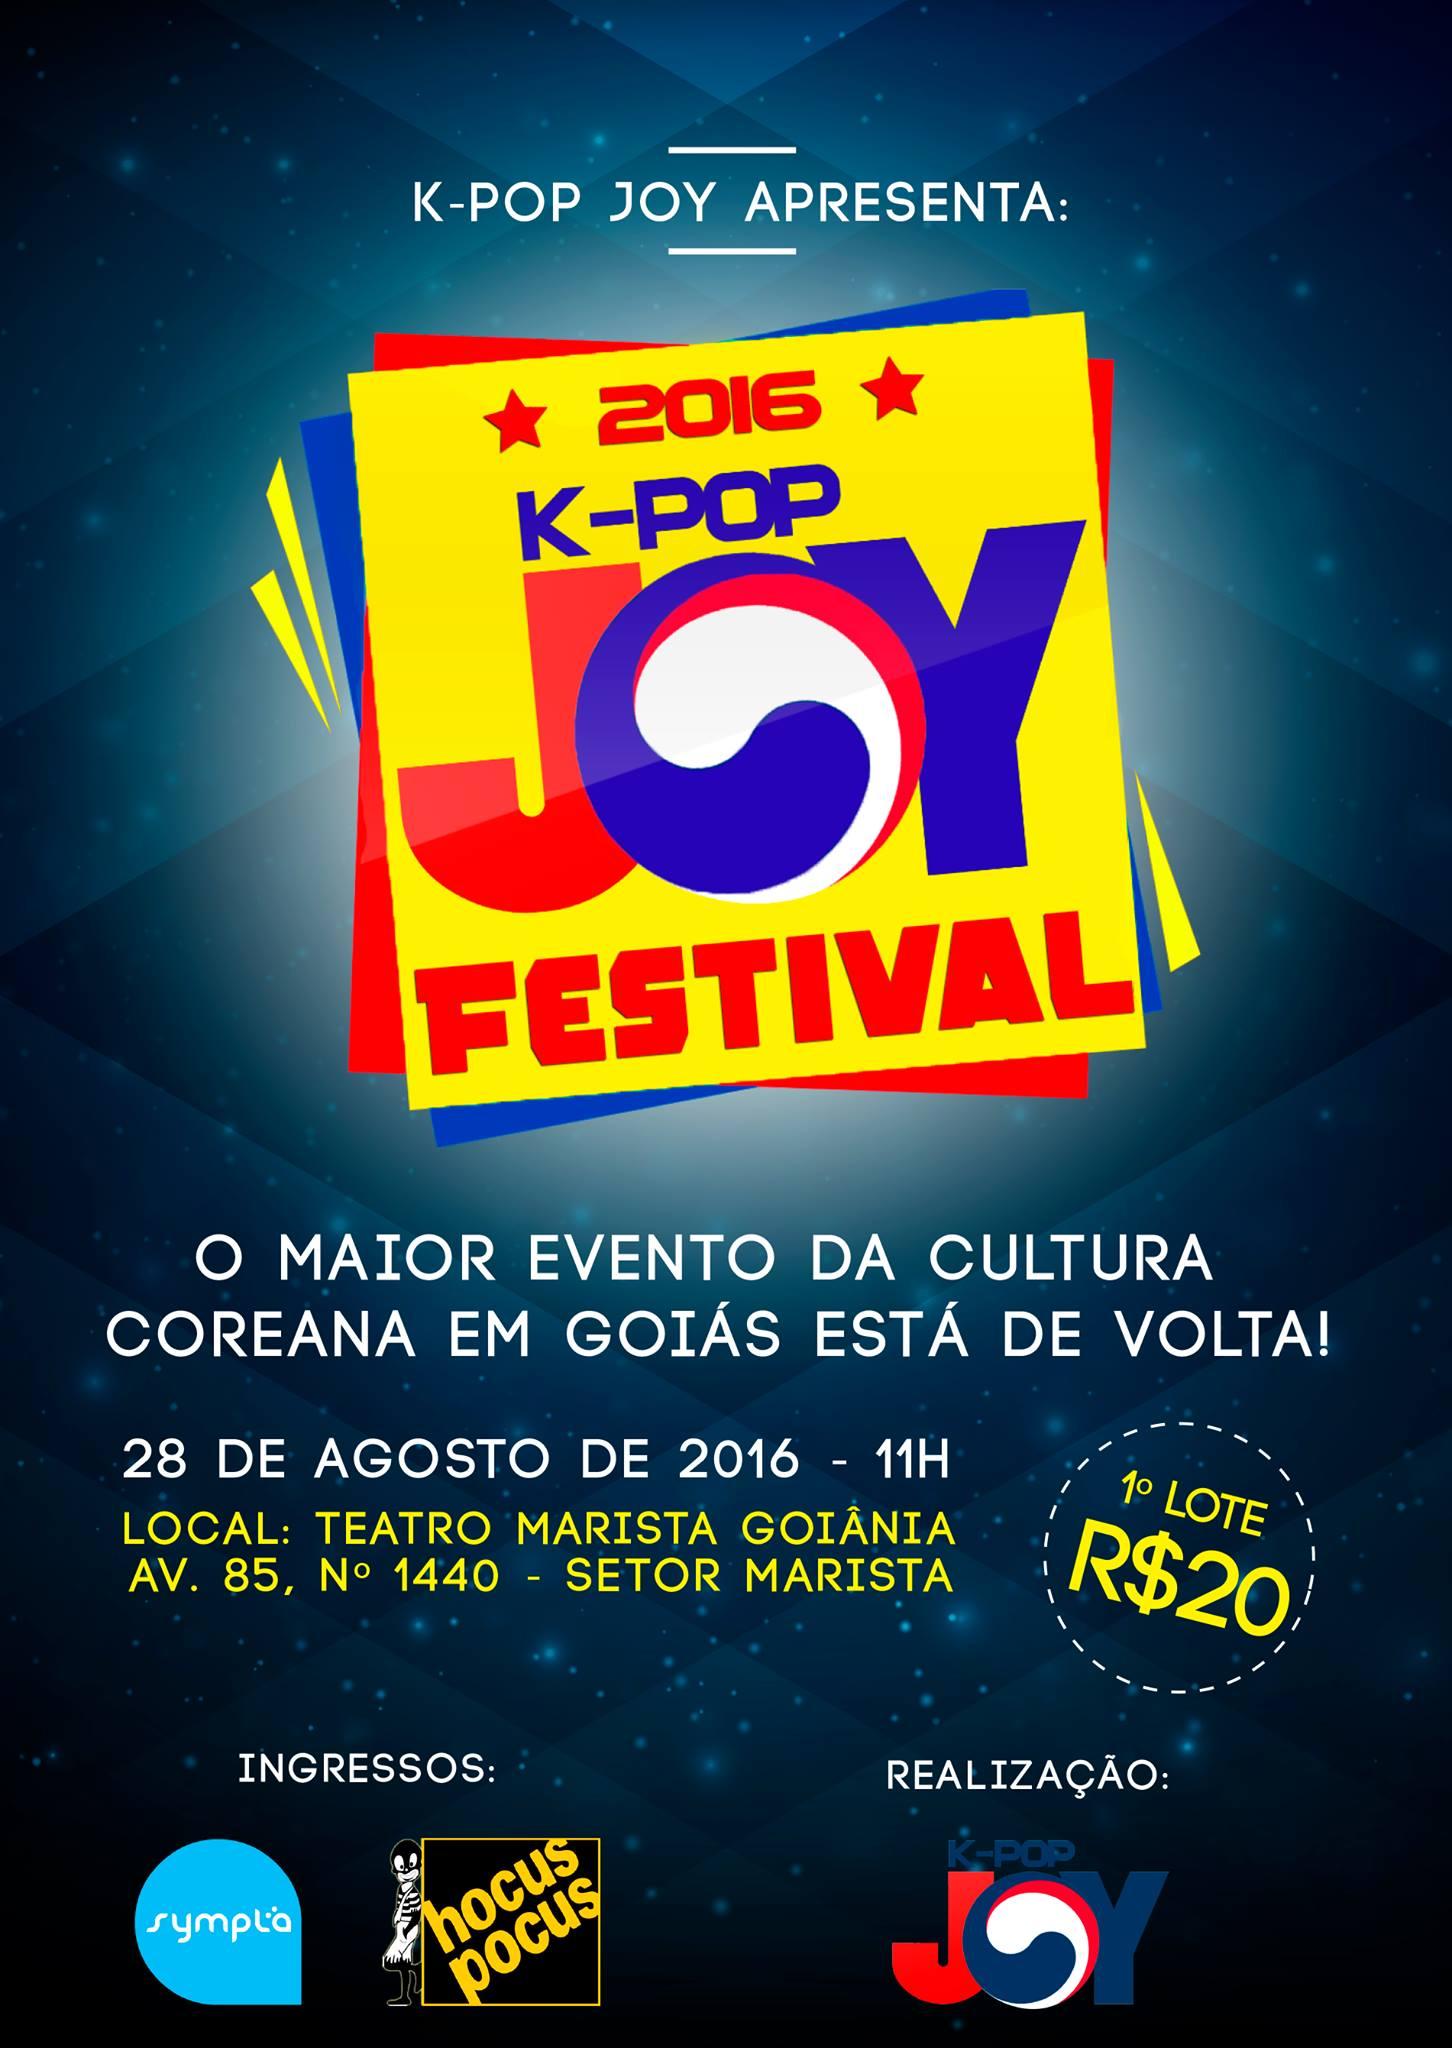 K-Pop Joy Festival 2016